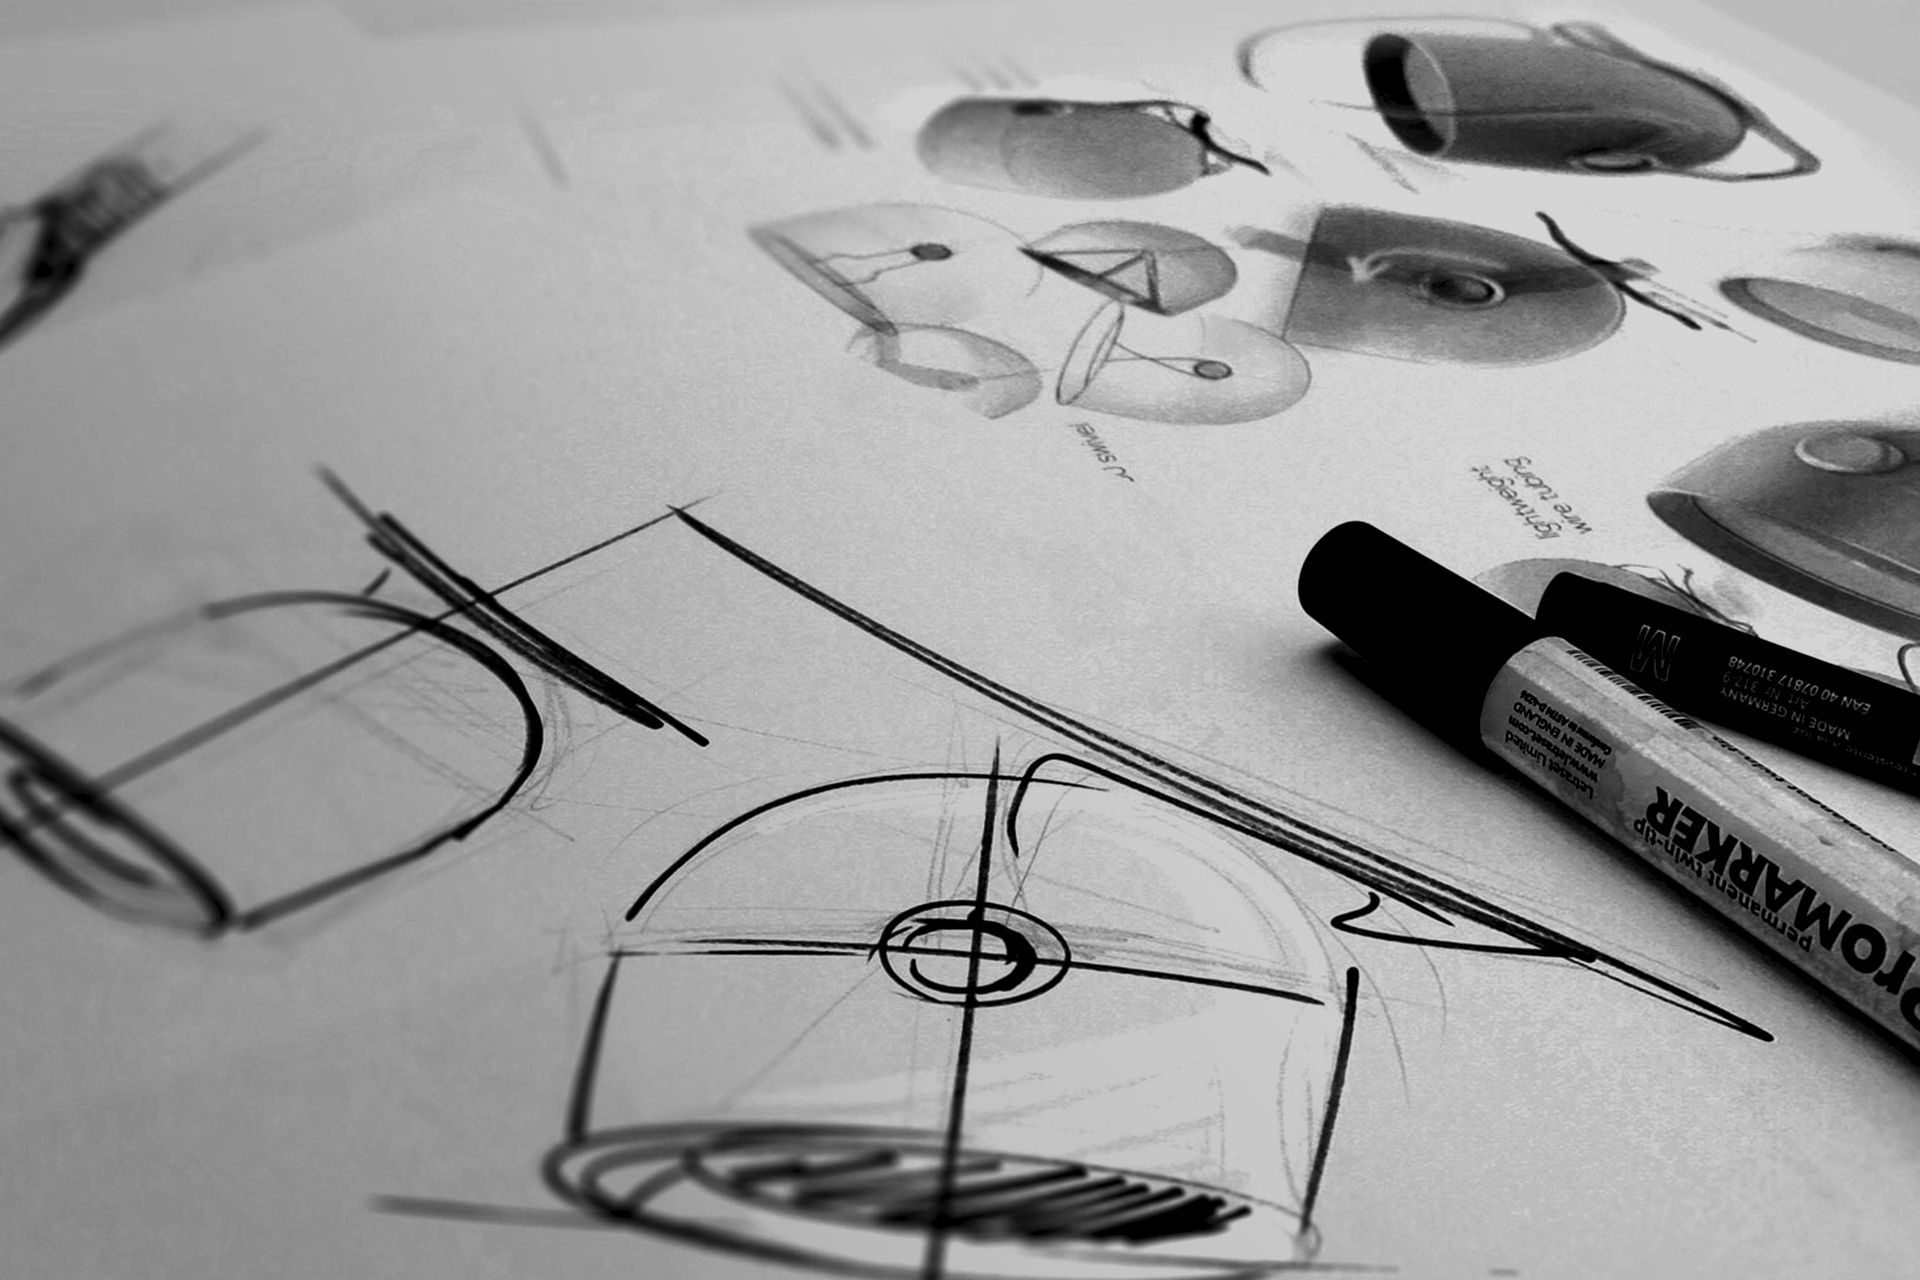 Solari - Press - Interface Sketches